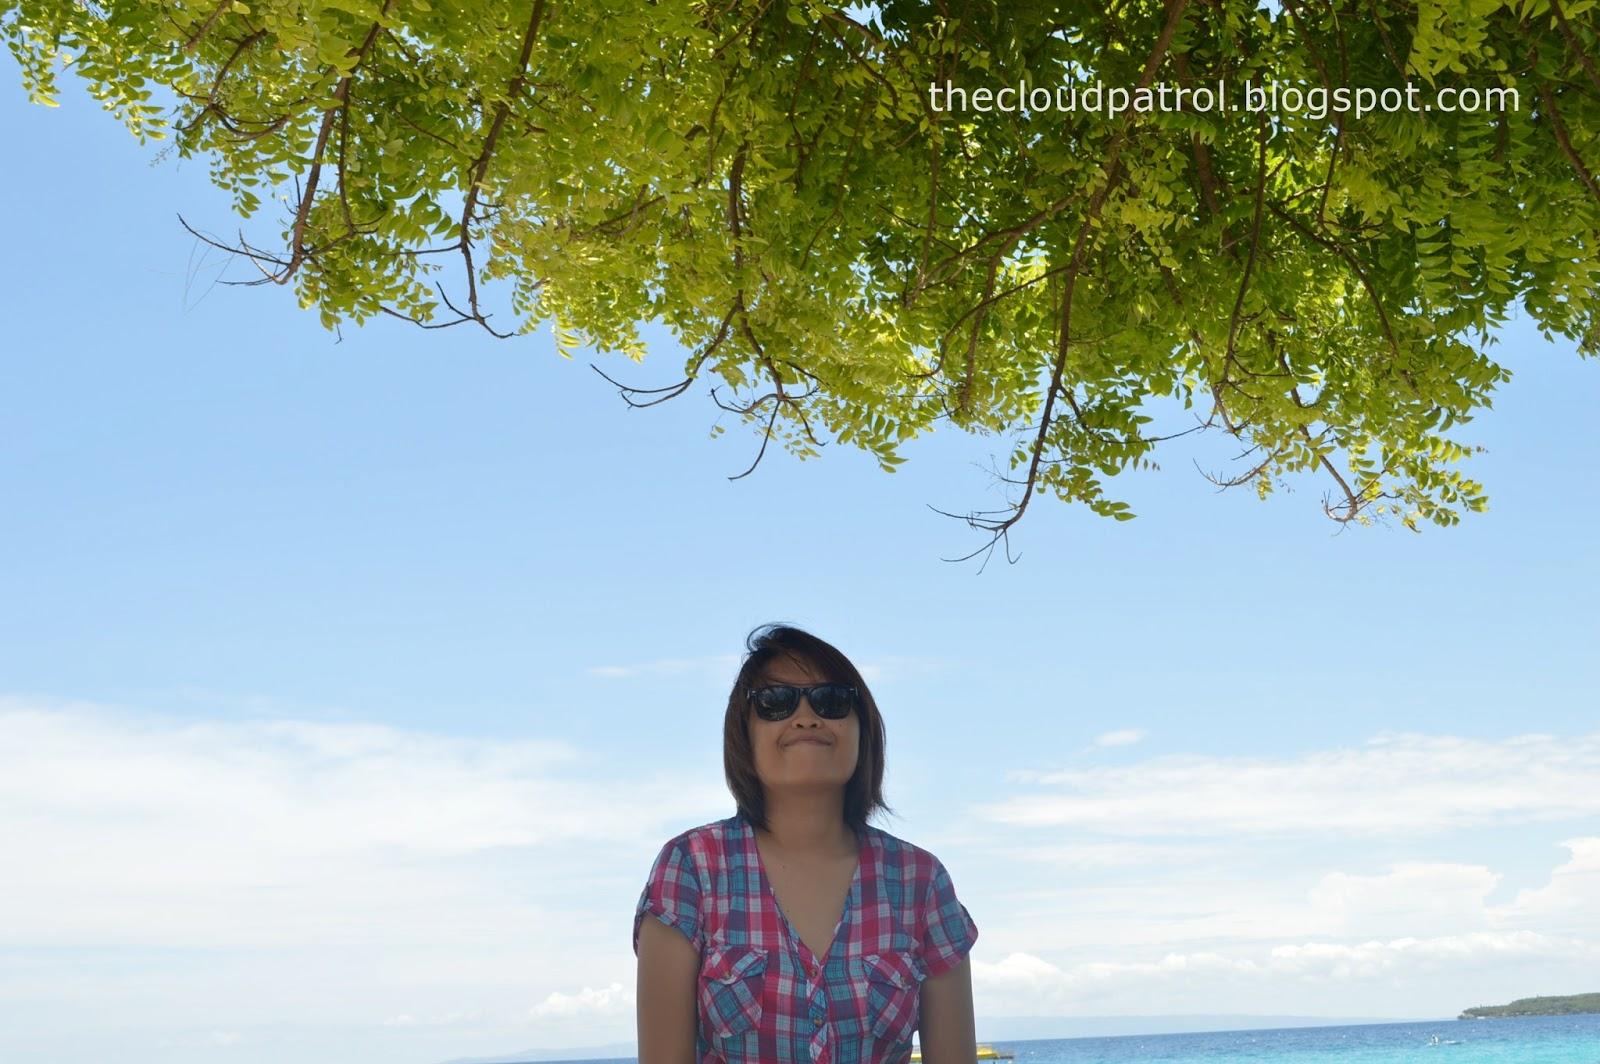 Butanding, whale shark, cebu, oslob, philippines